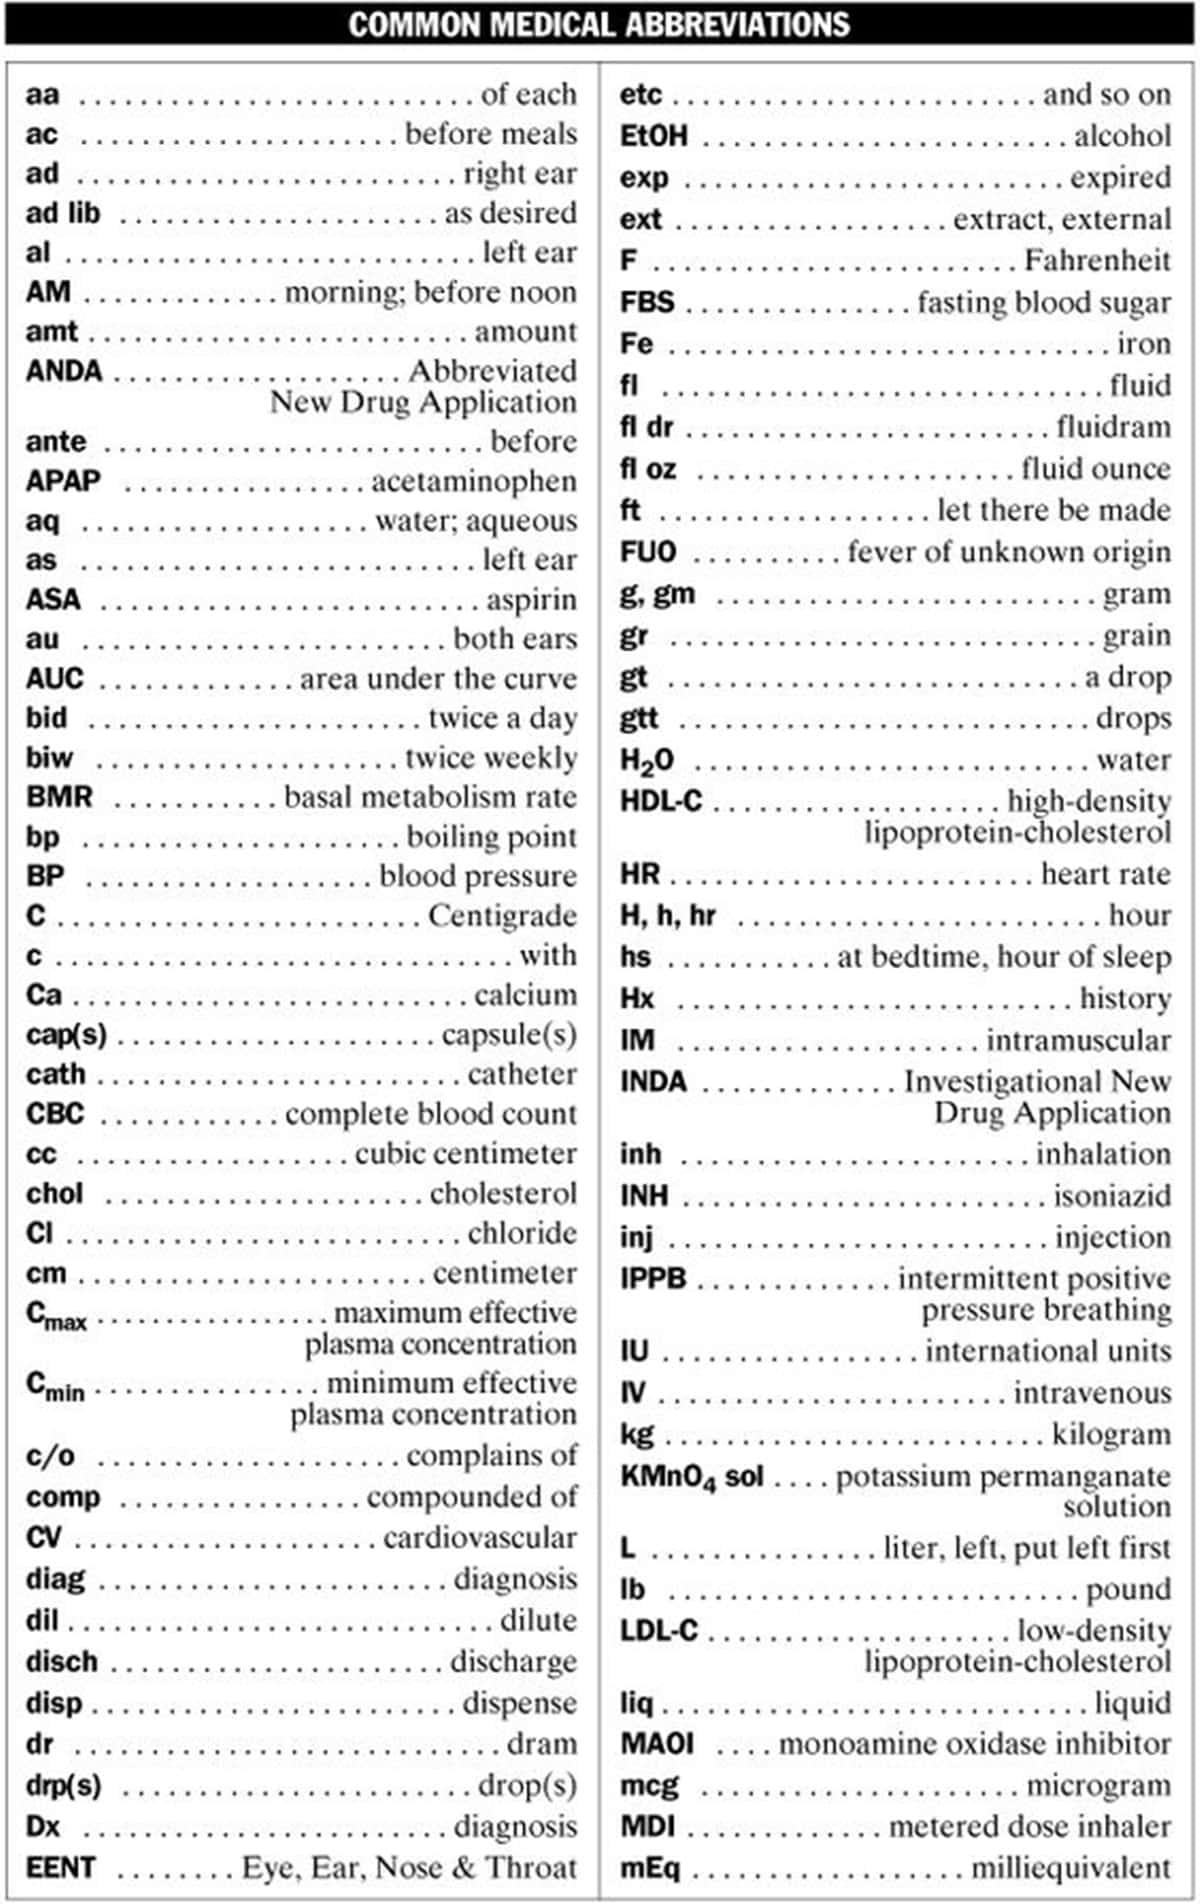 50 Popular Medical Abbreviations In English You Should